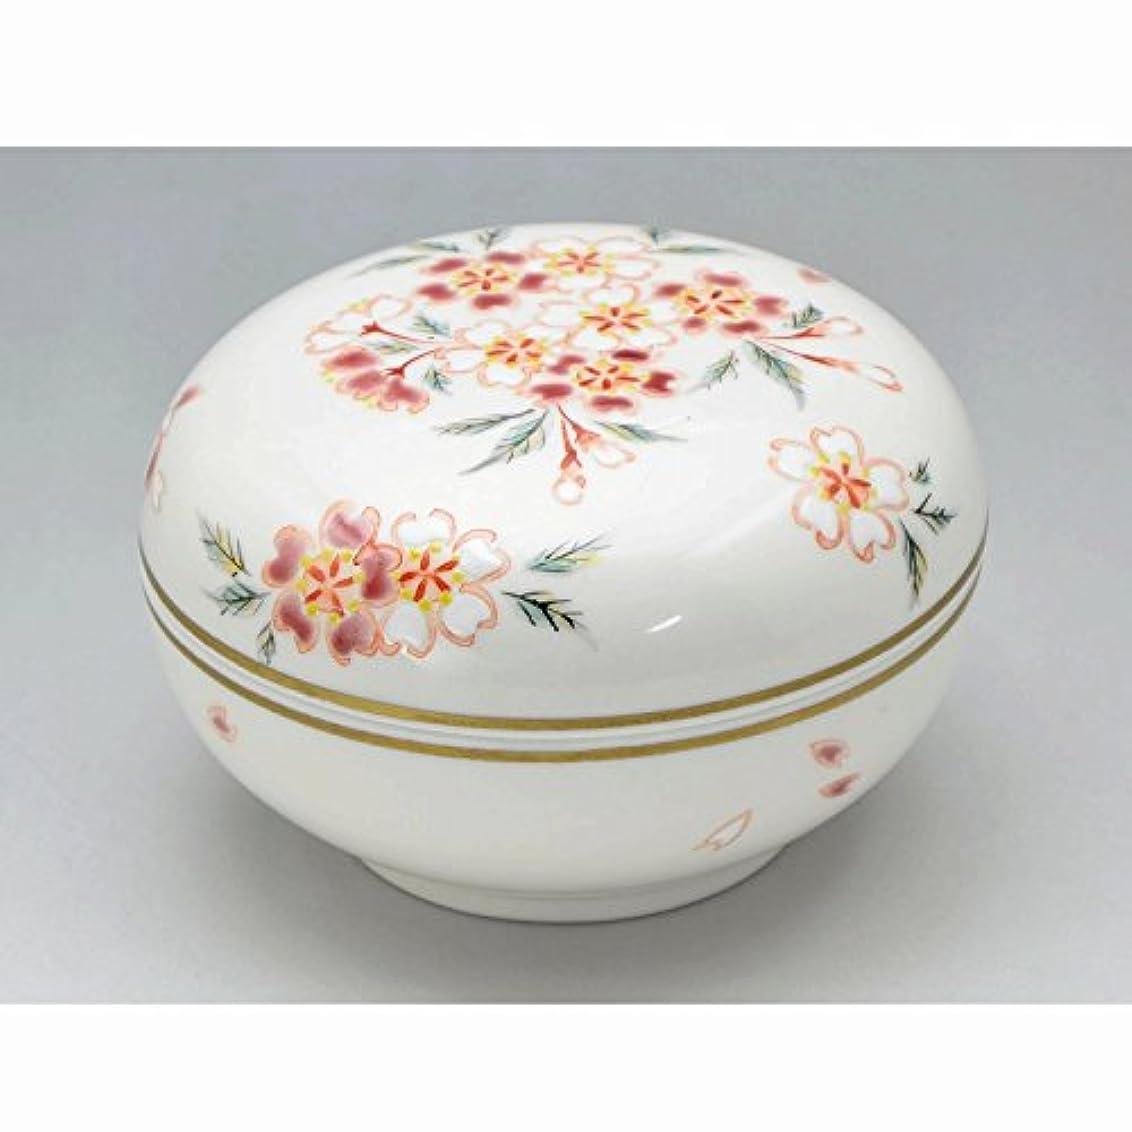 煙突複合保証京焼?清水焼 磁器 香合 花桜 紙箱入 Kiyomizu-kyo yaki ware. Japanese porcelain kogo incense burner hanazakura with paper box.